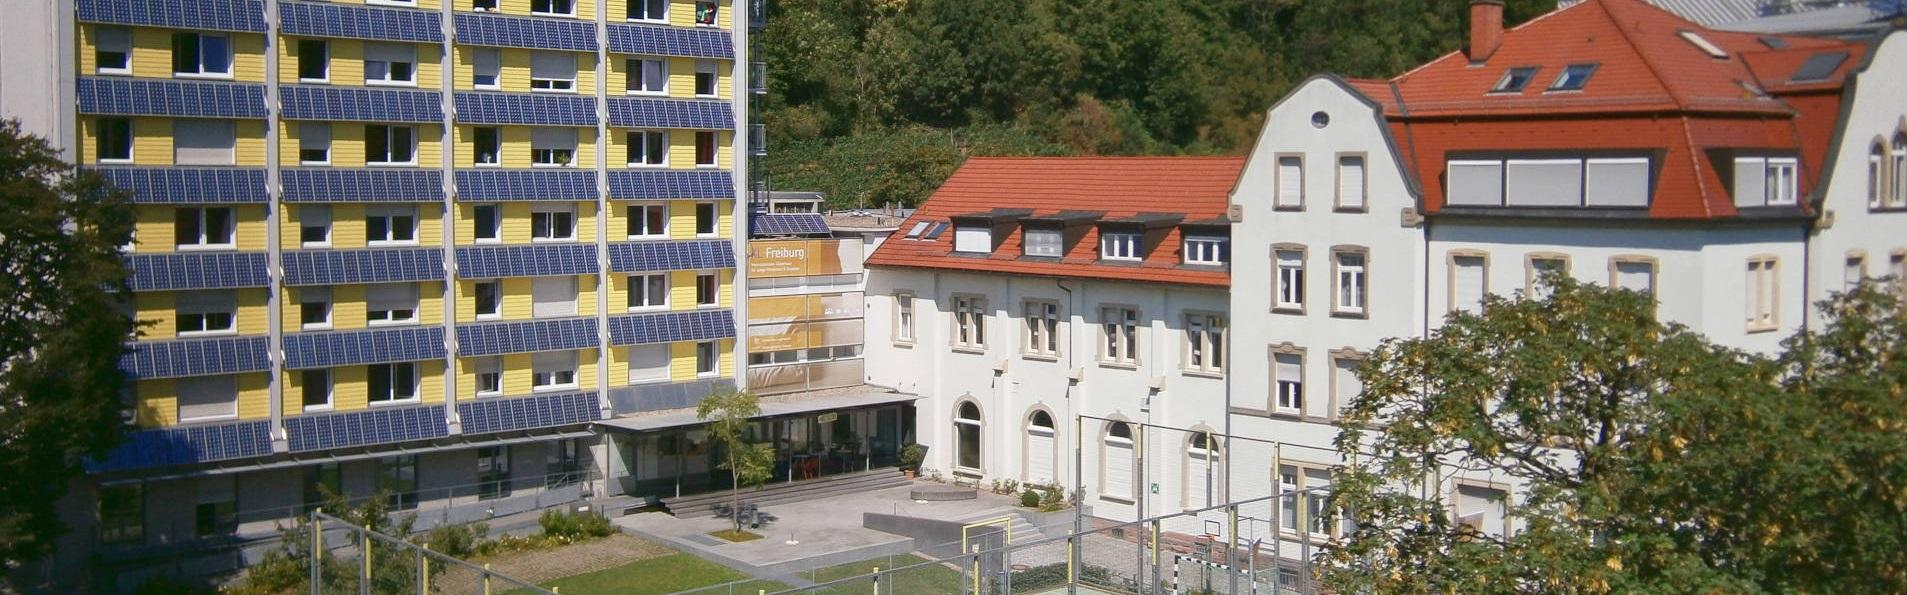 humboldt institut freiburg yaz kampı